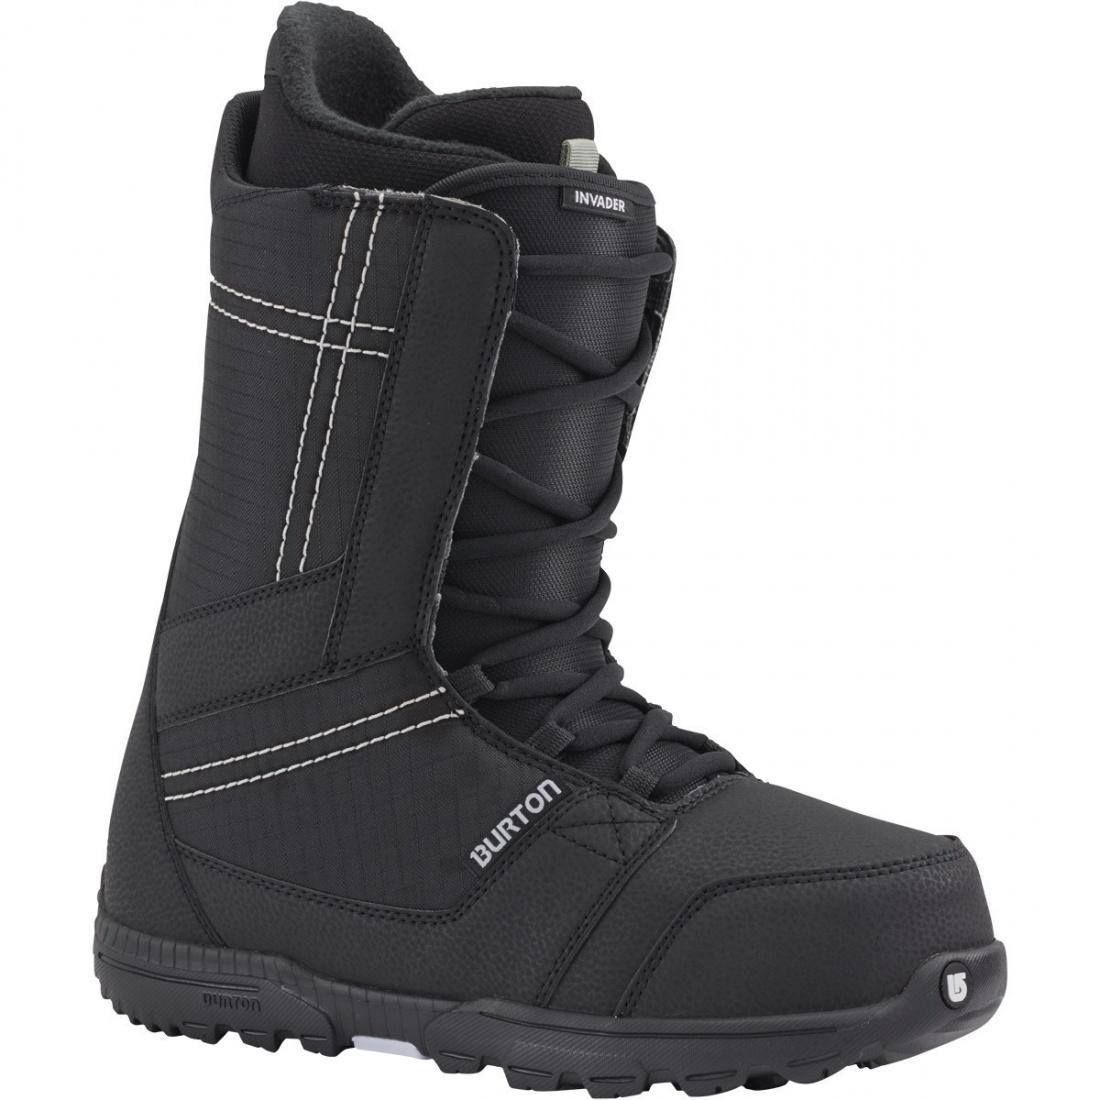 Ботинки для сноуборда Burton Invader Black/Cyan 10